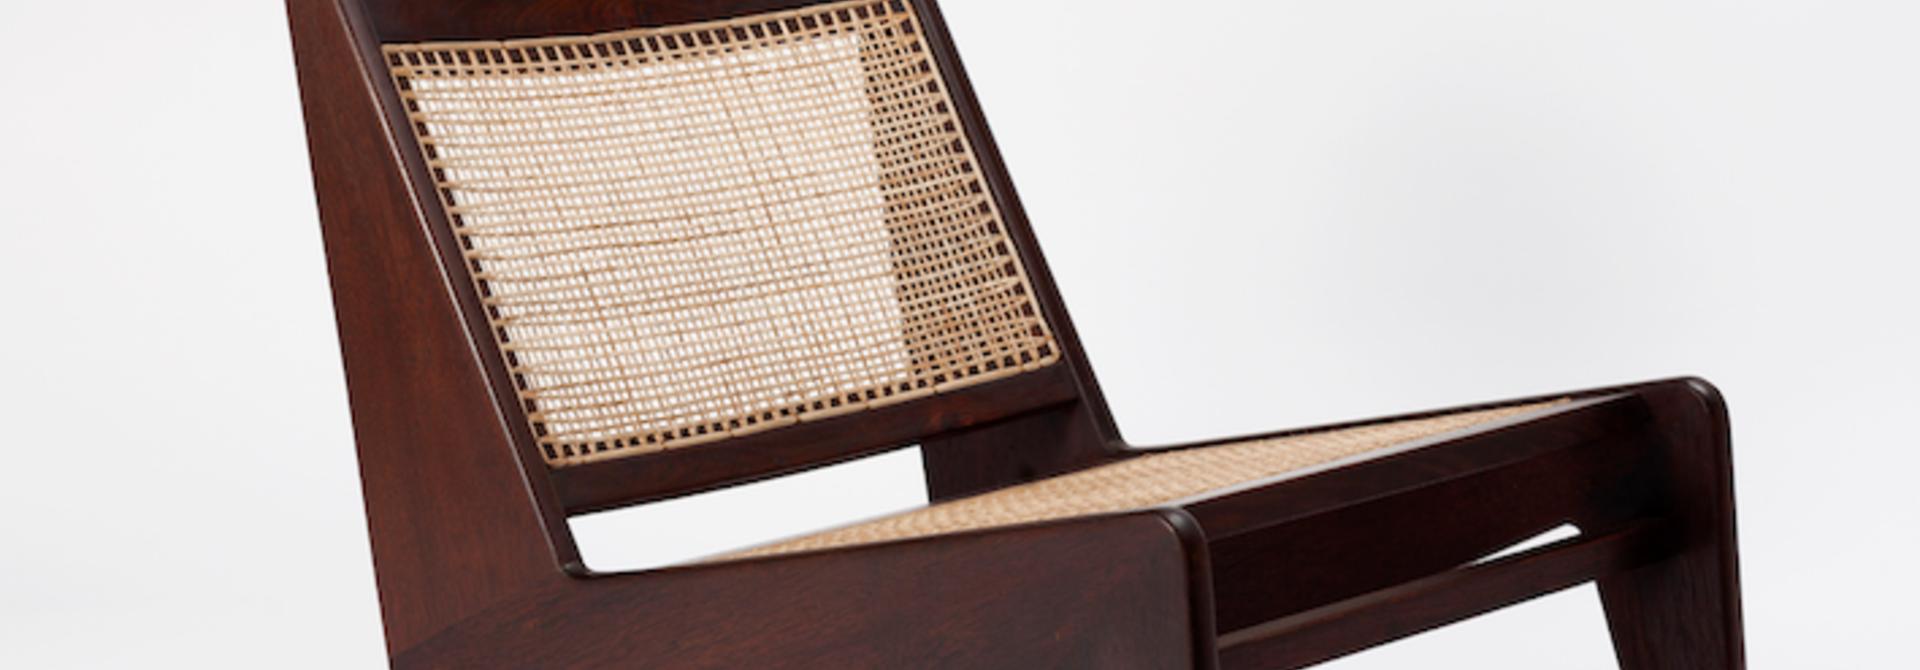 Kangaroo Chair - Pierre Jeanneret